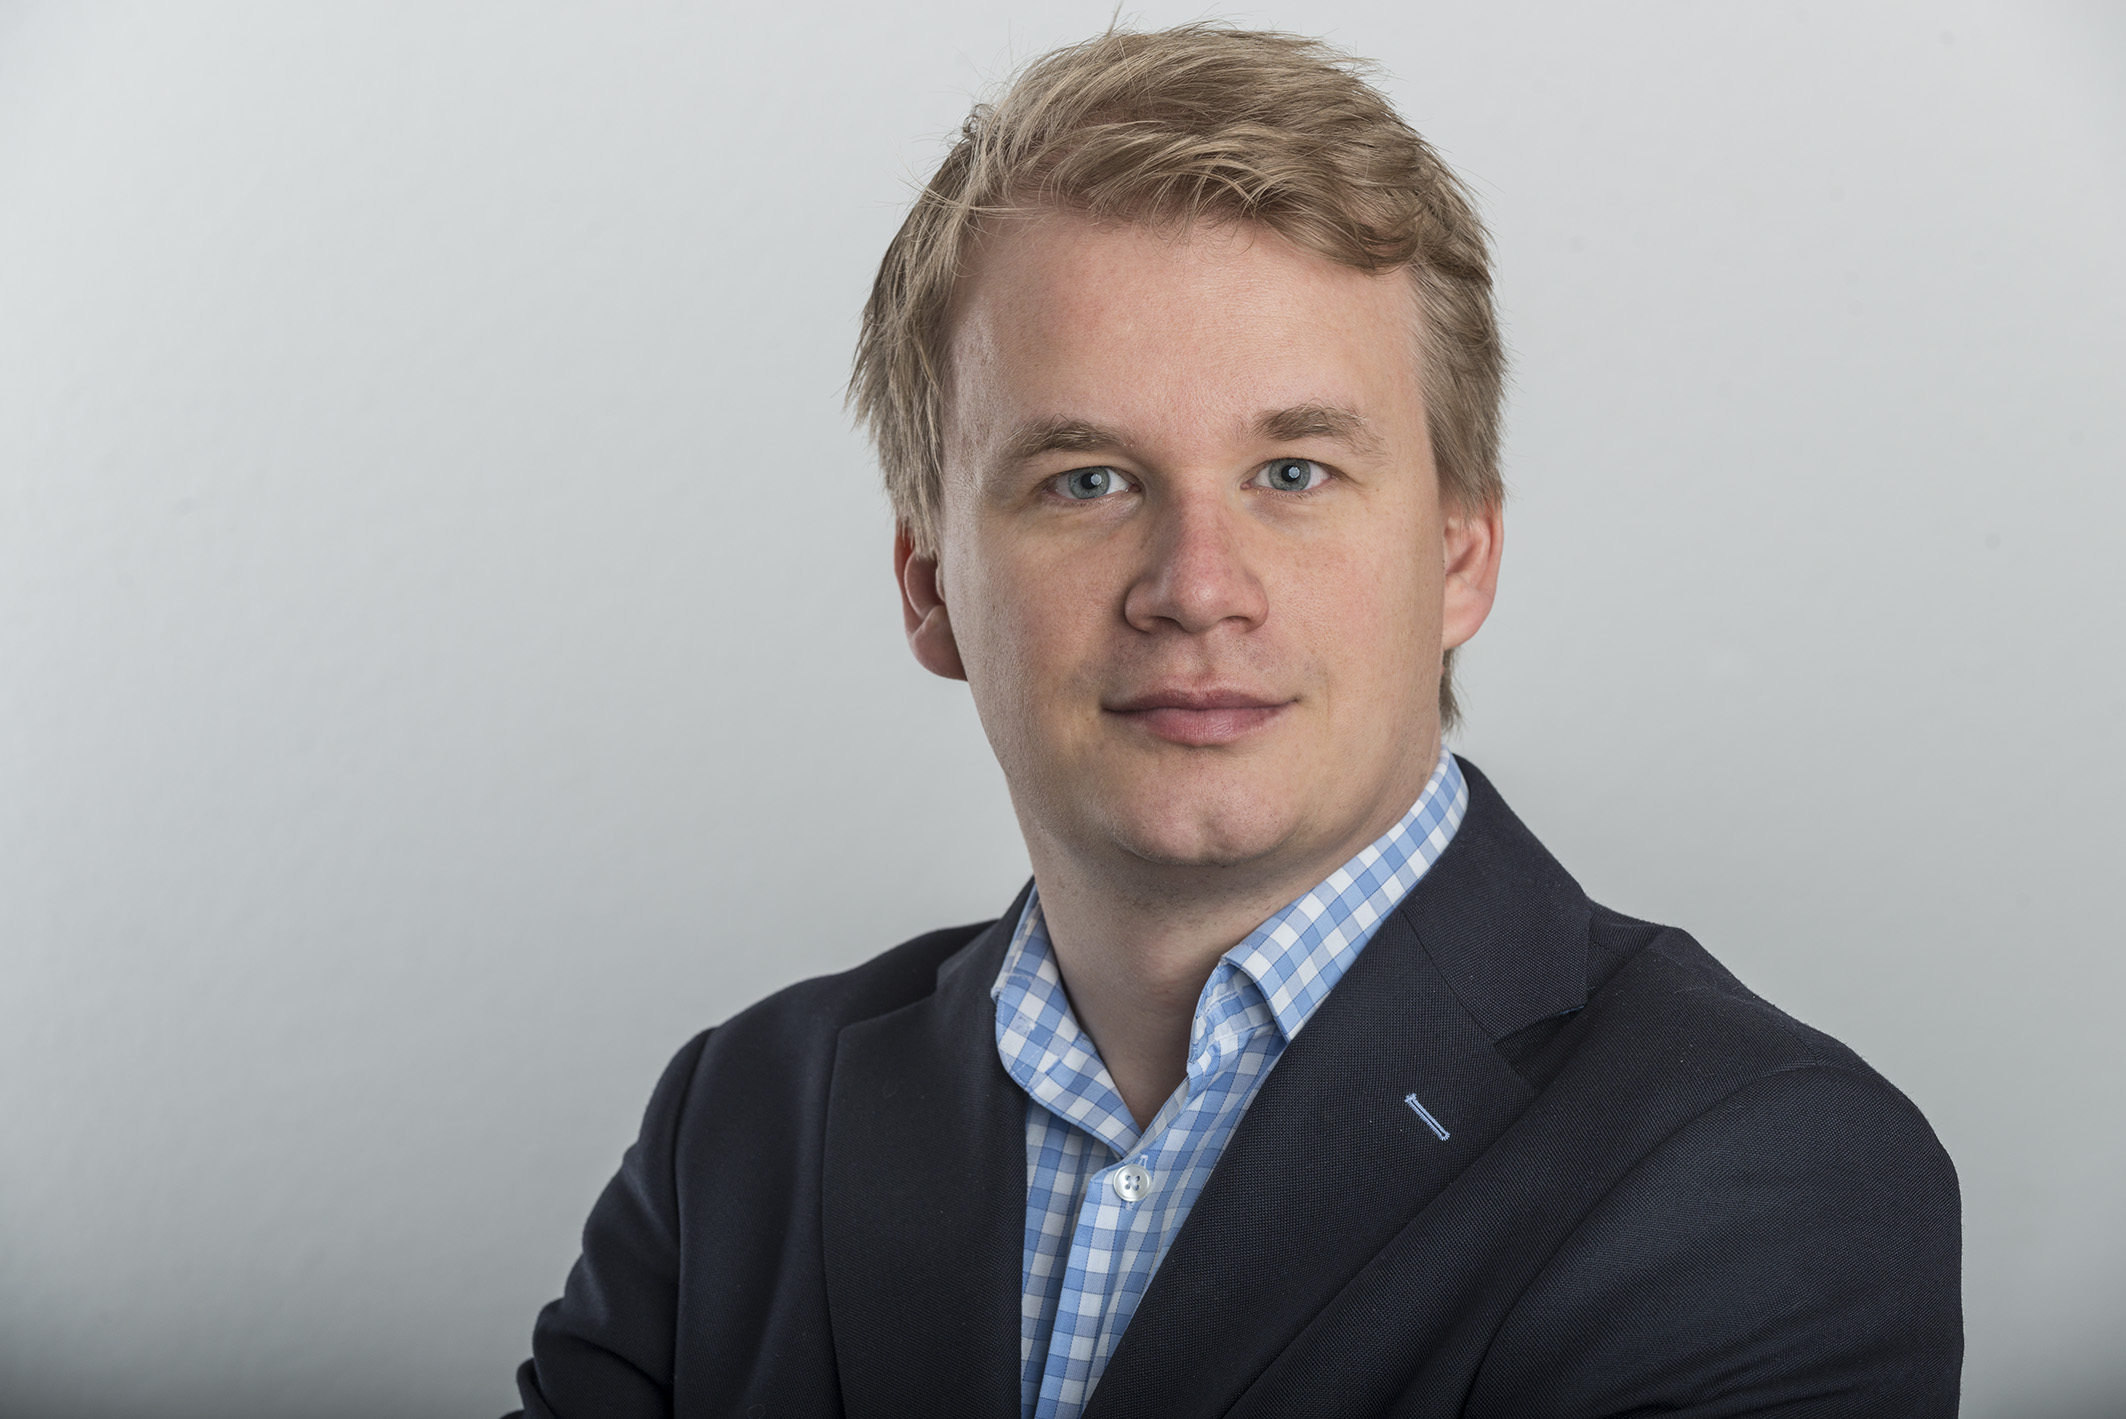 Martin Obschonka, Saarland University